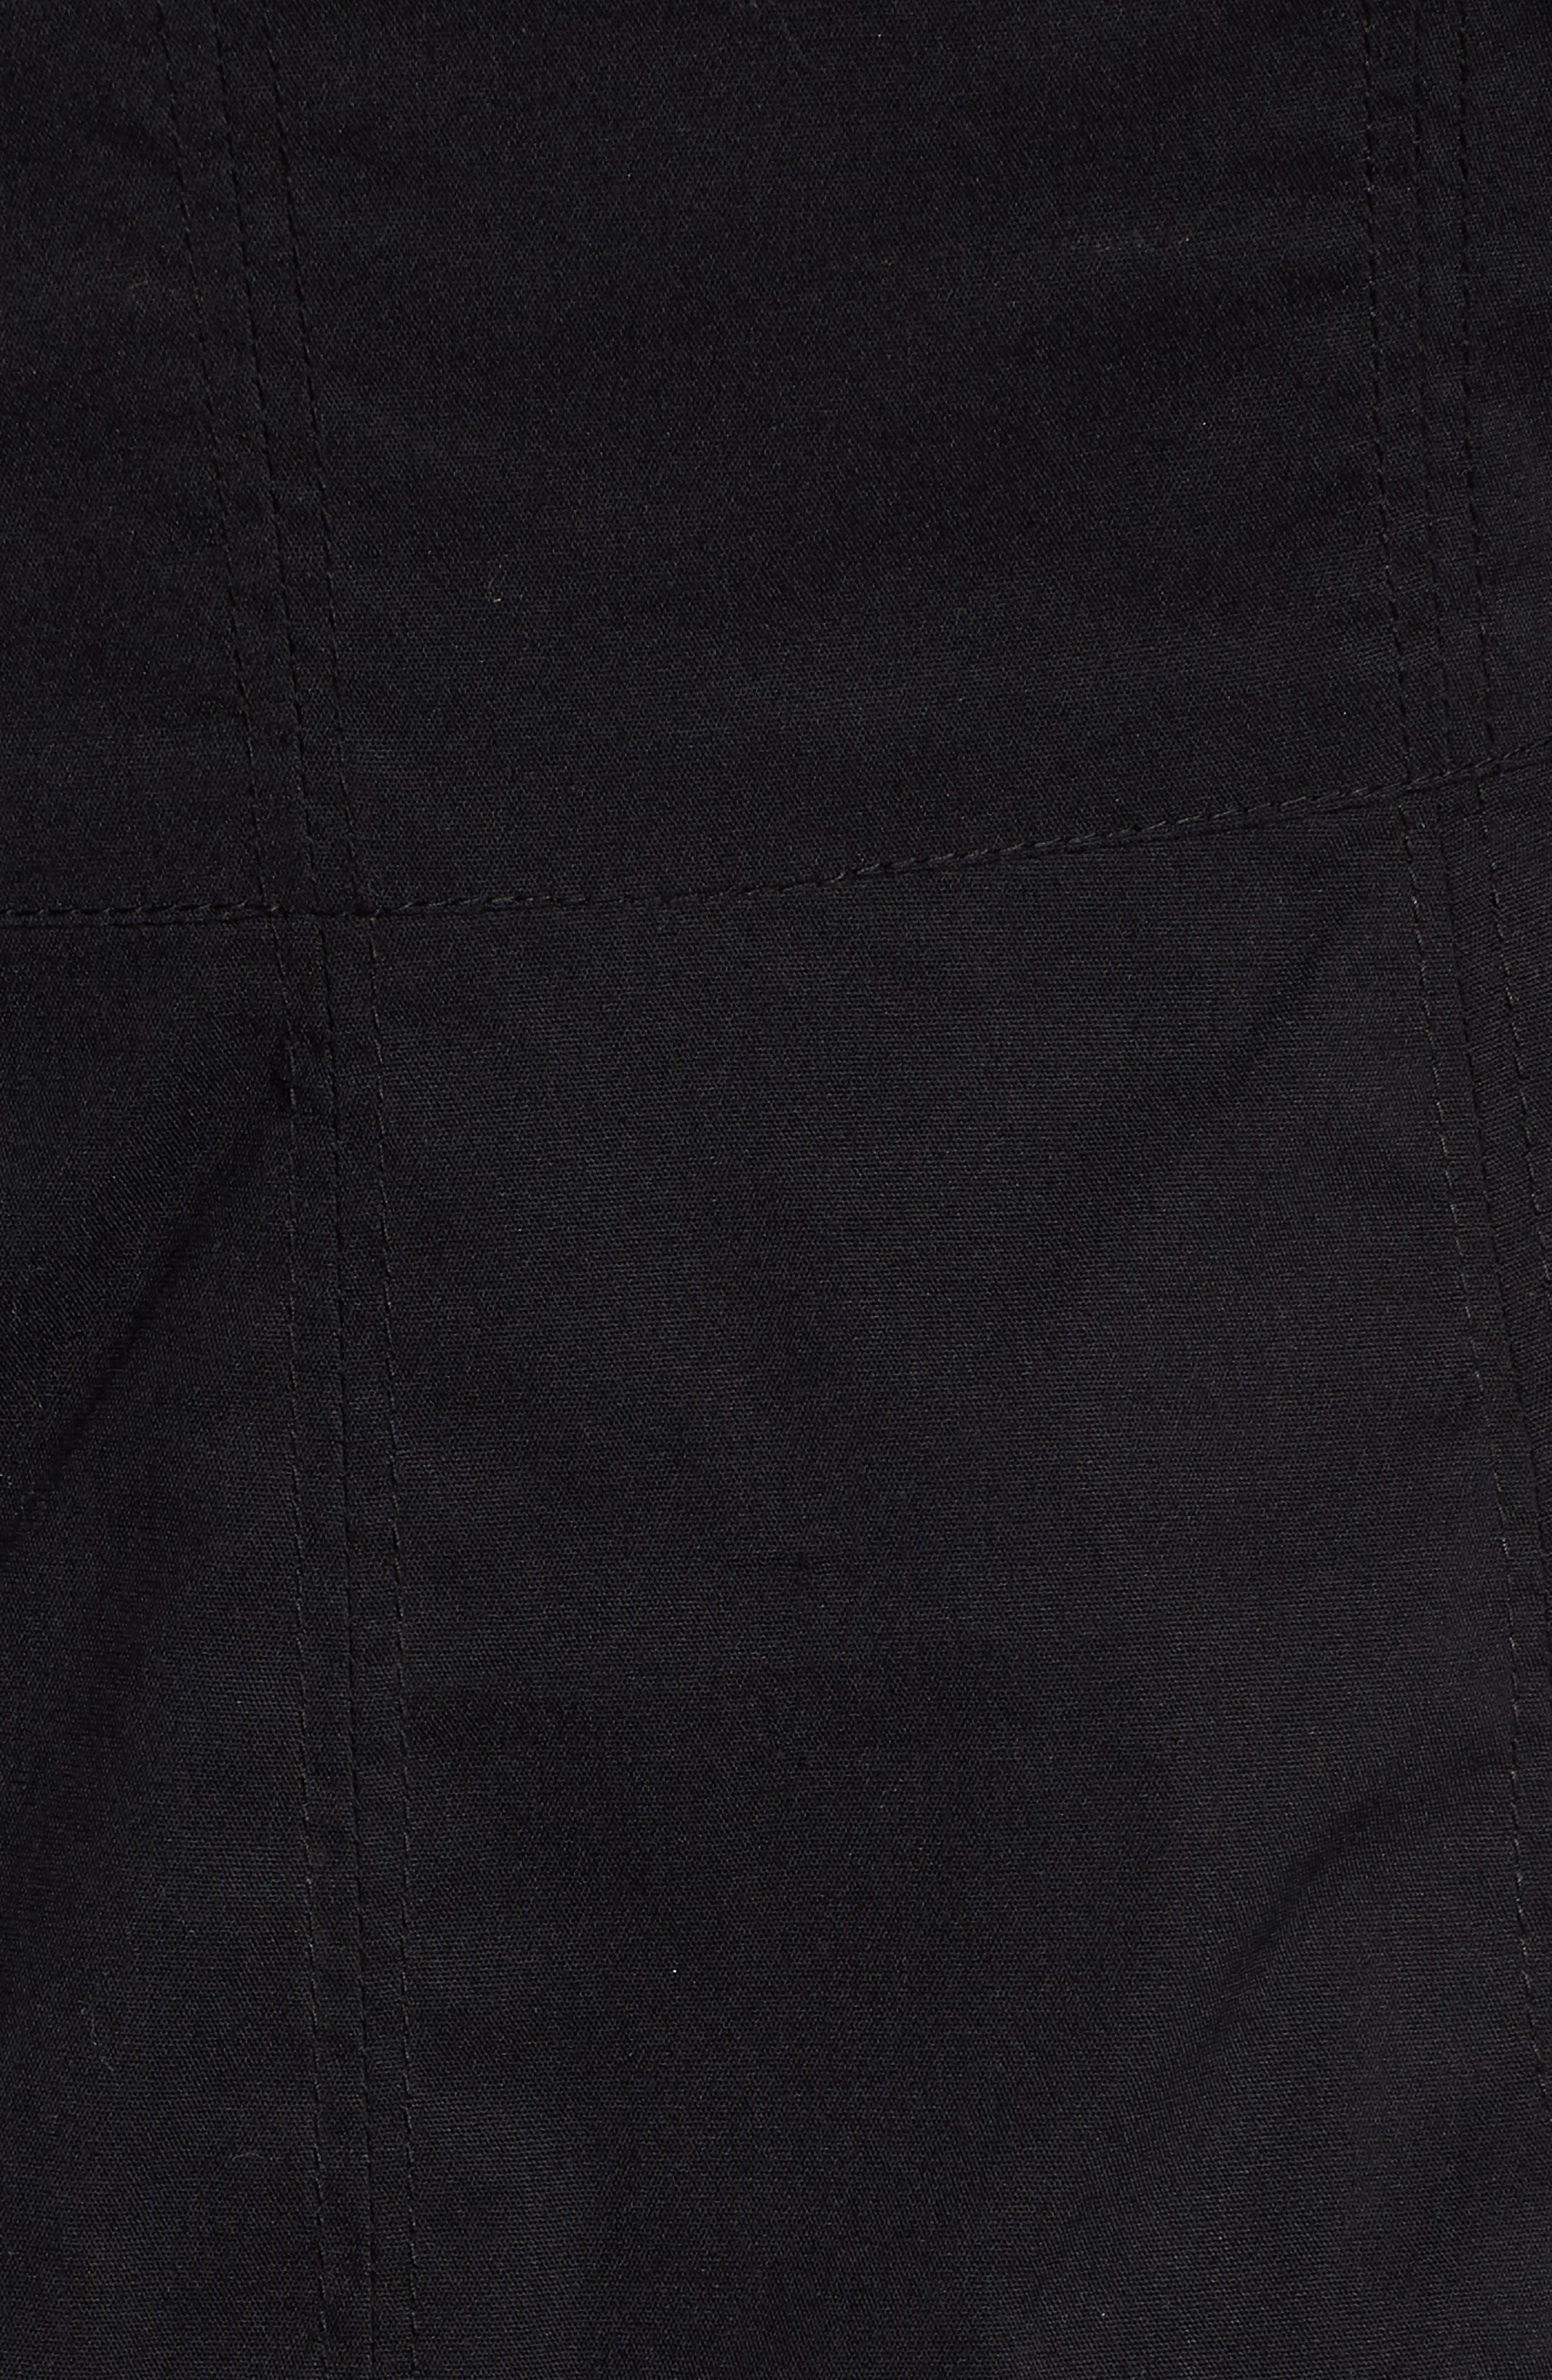 Ruffle One-Shoulder Dress,                             Alternate thumbnail 6, color,                             Black